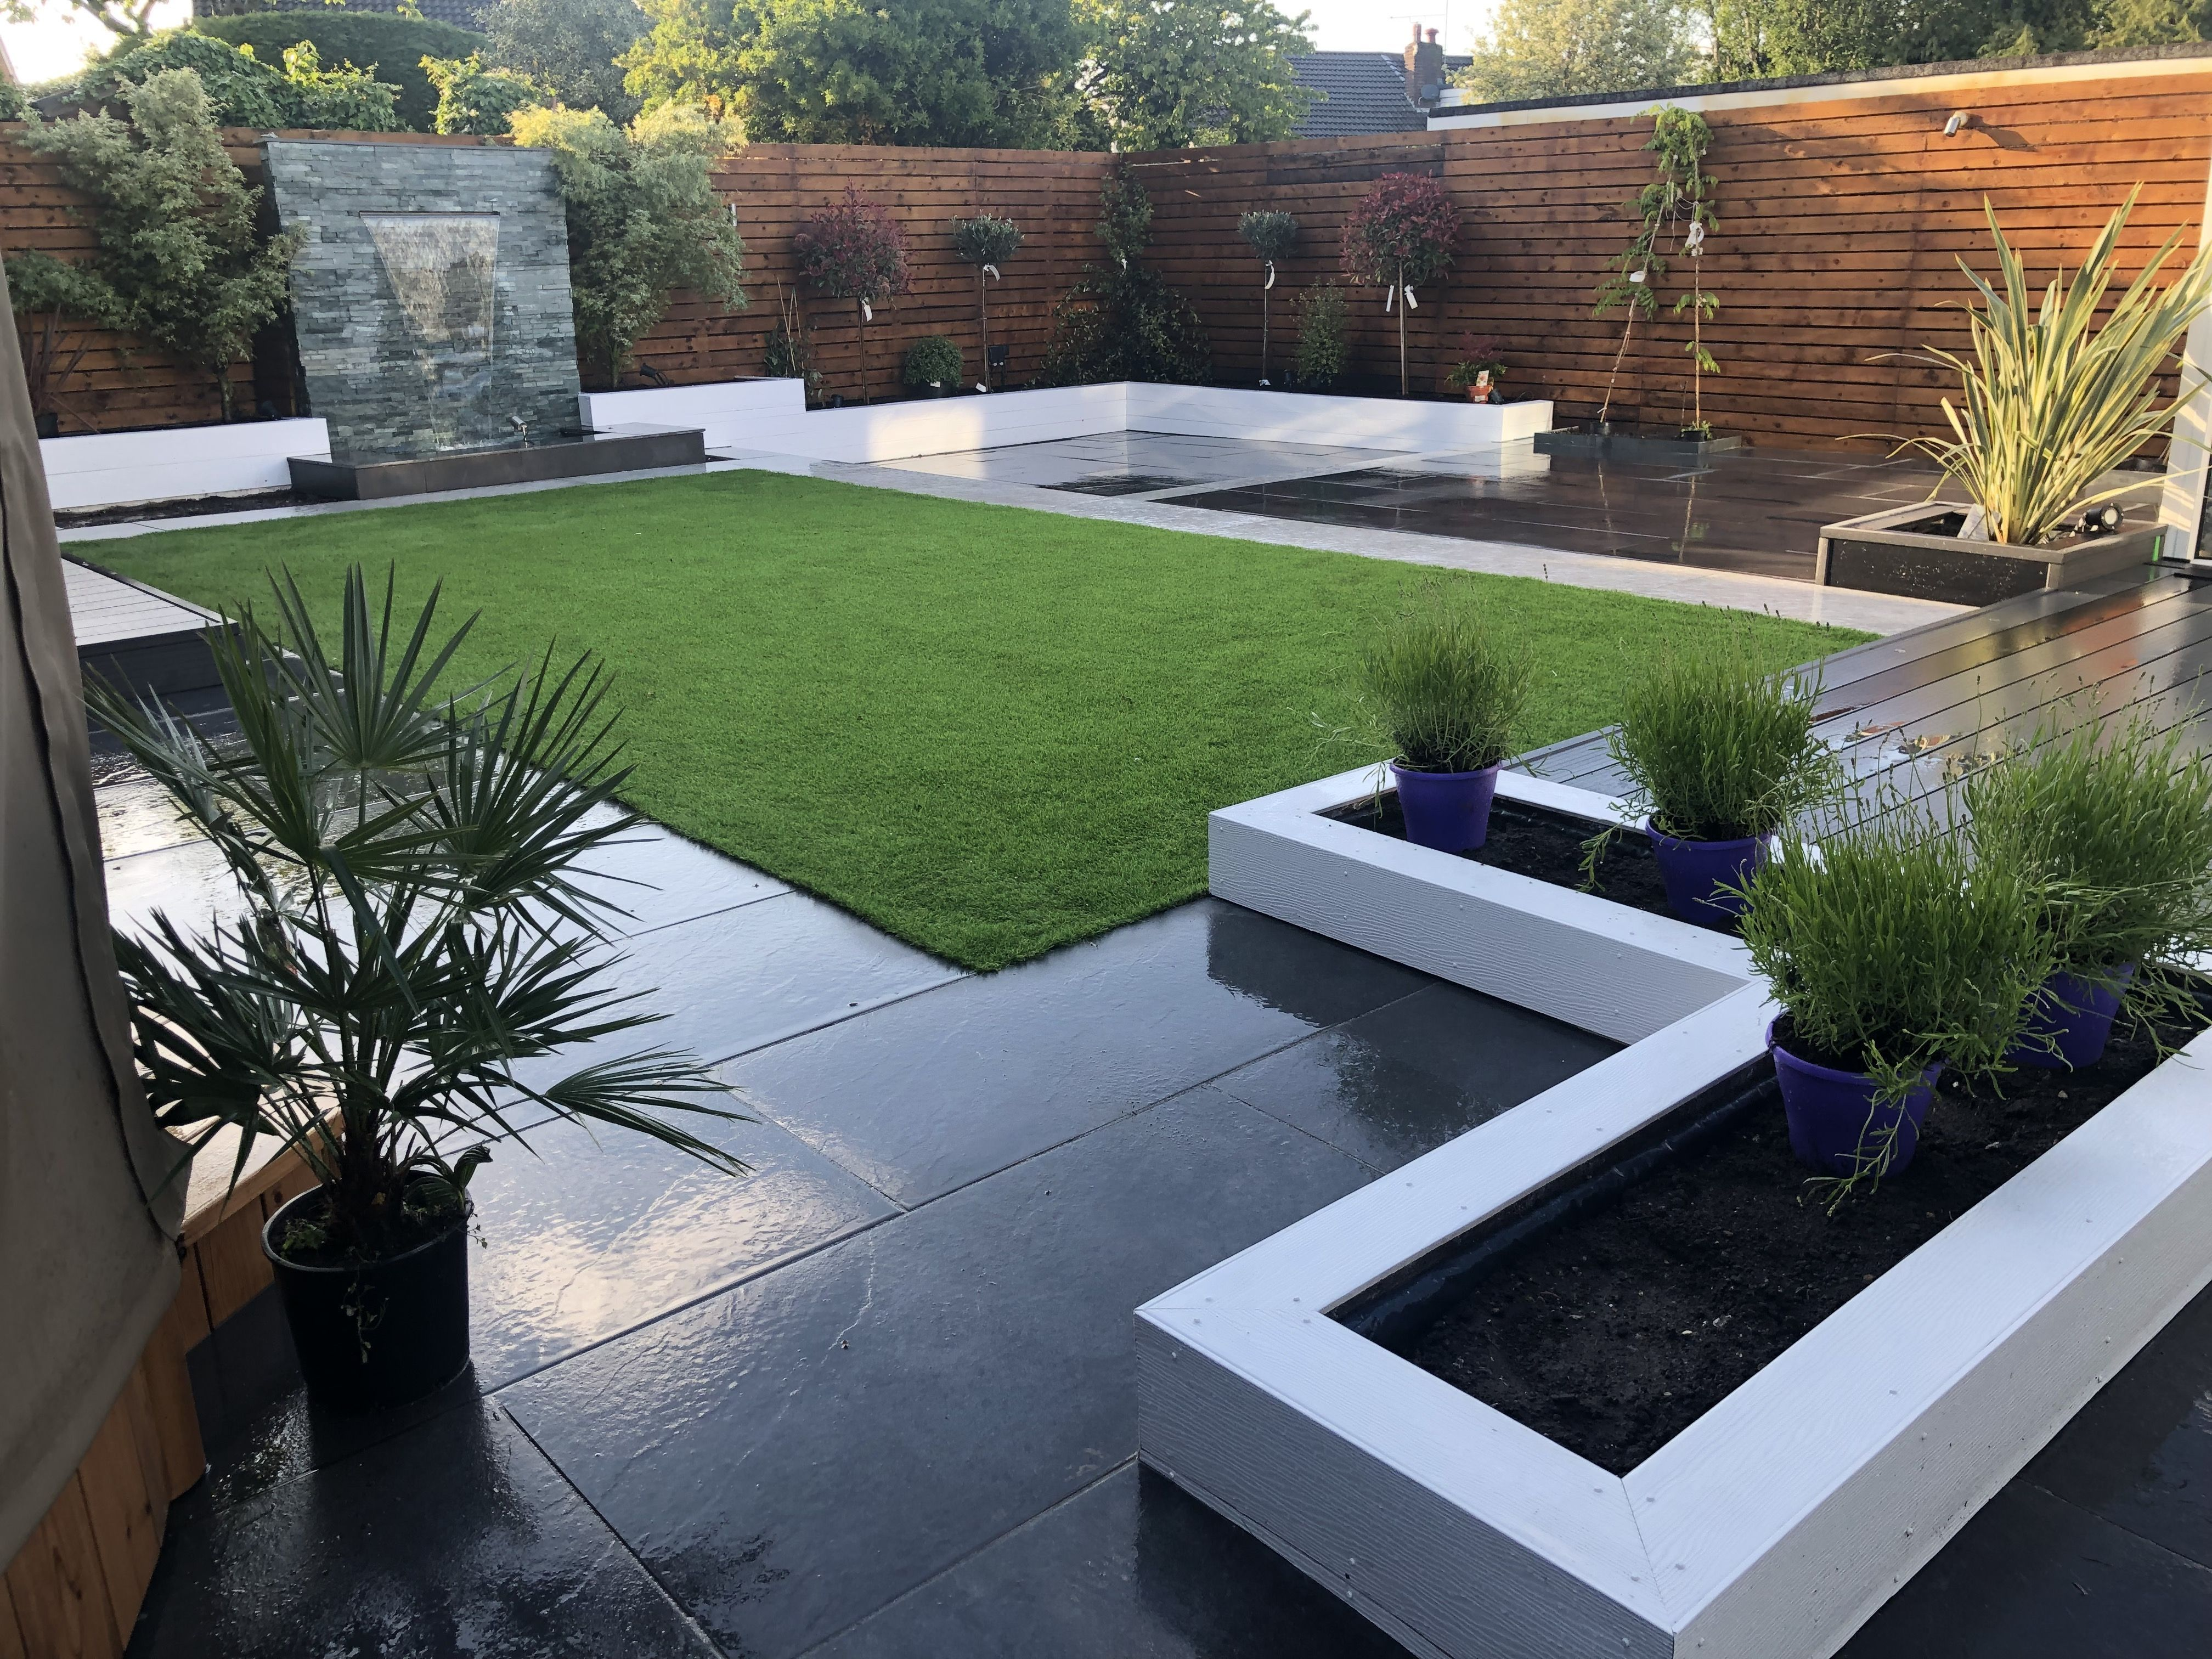 Taman Pangopenan Ormskirk In 2020 Low Maintenance Garden Outdoor Gardens Design Backyard Landscaping Designs